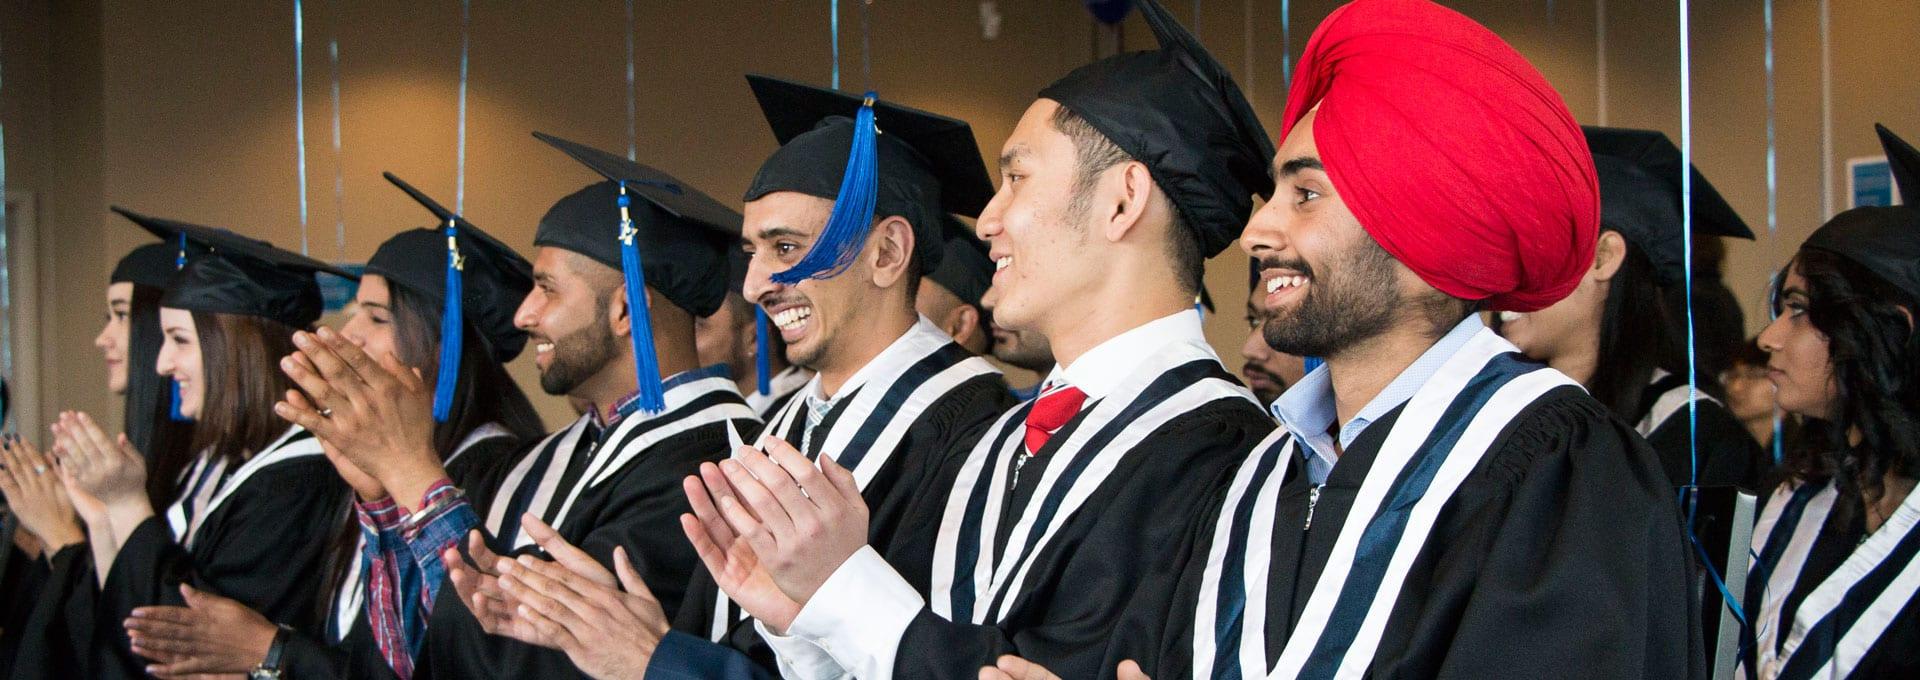 Students Celebrating Graduation, Alexander College